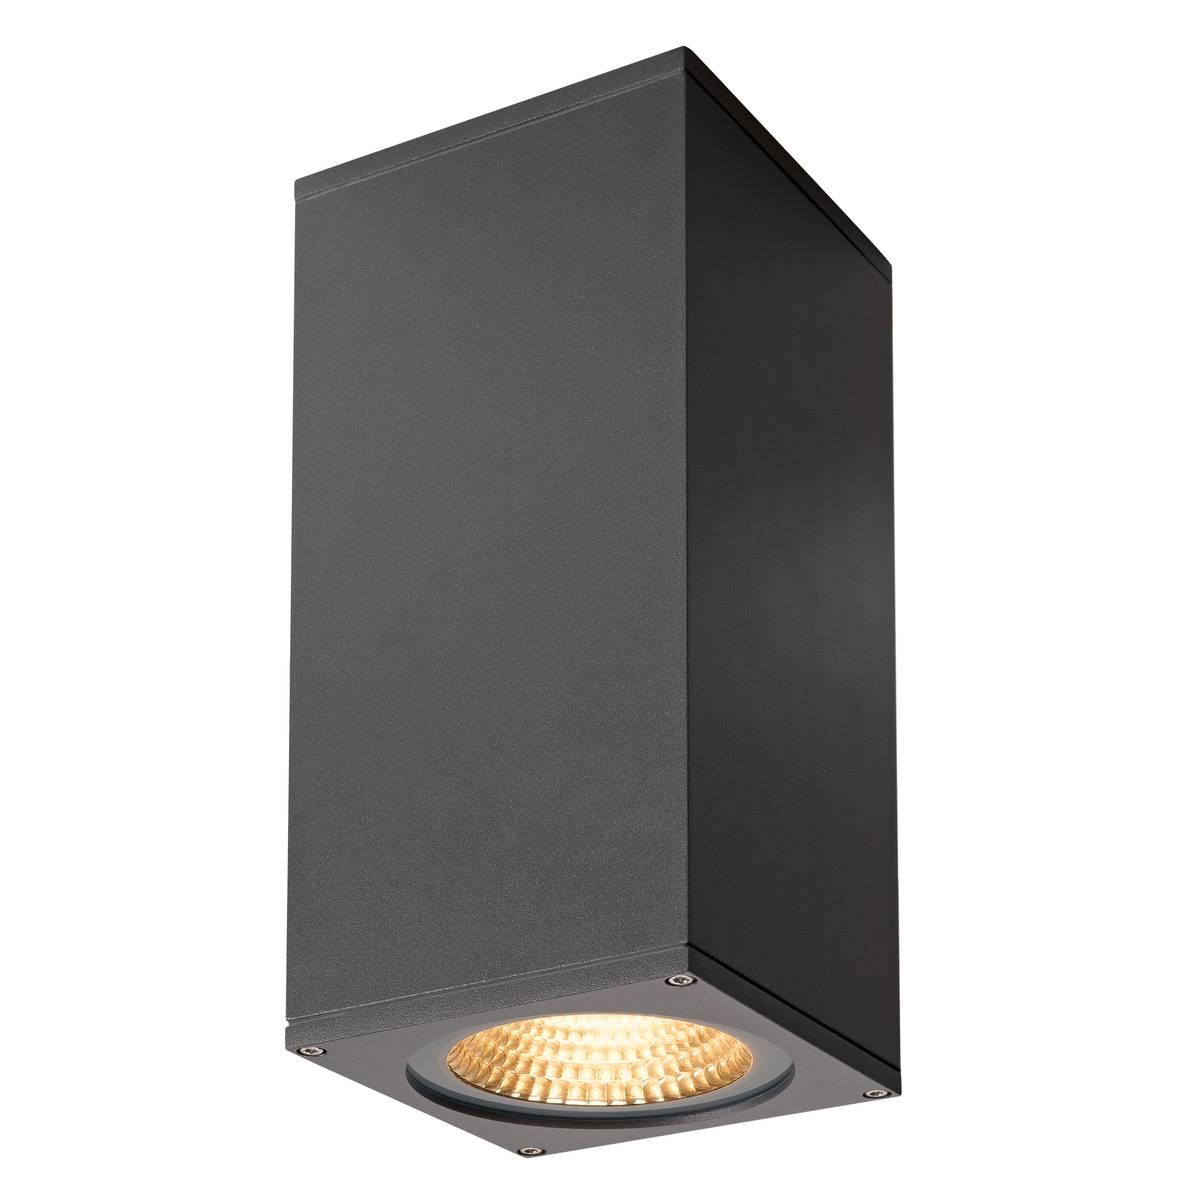 SLV buiten wandlamp Big Theo Wall - antraciet 2xflood